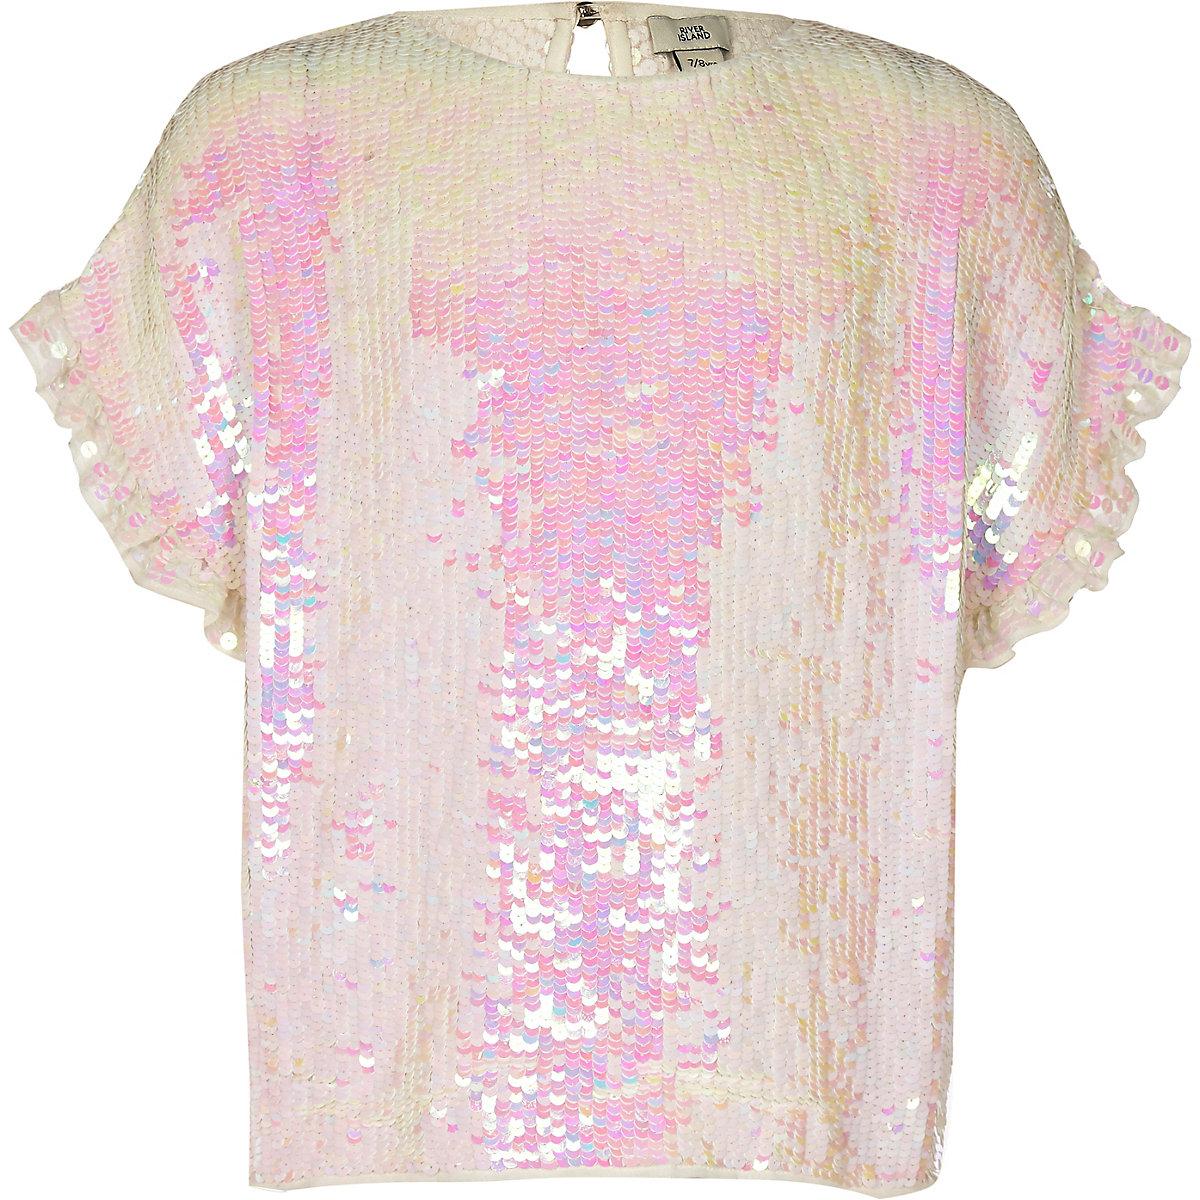 Girls white sequin embellished T-shirt